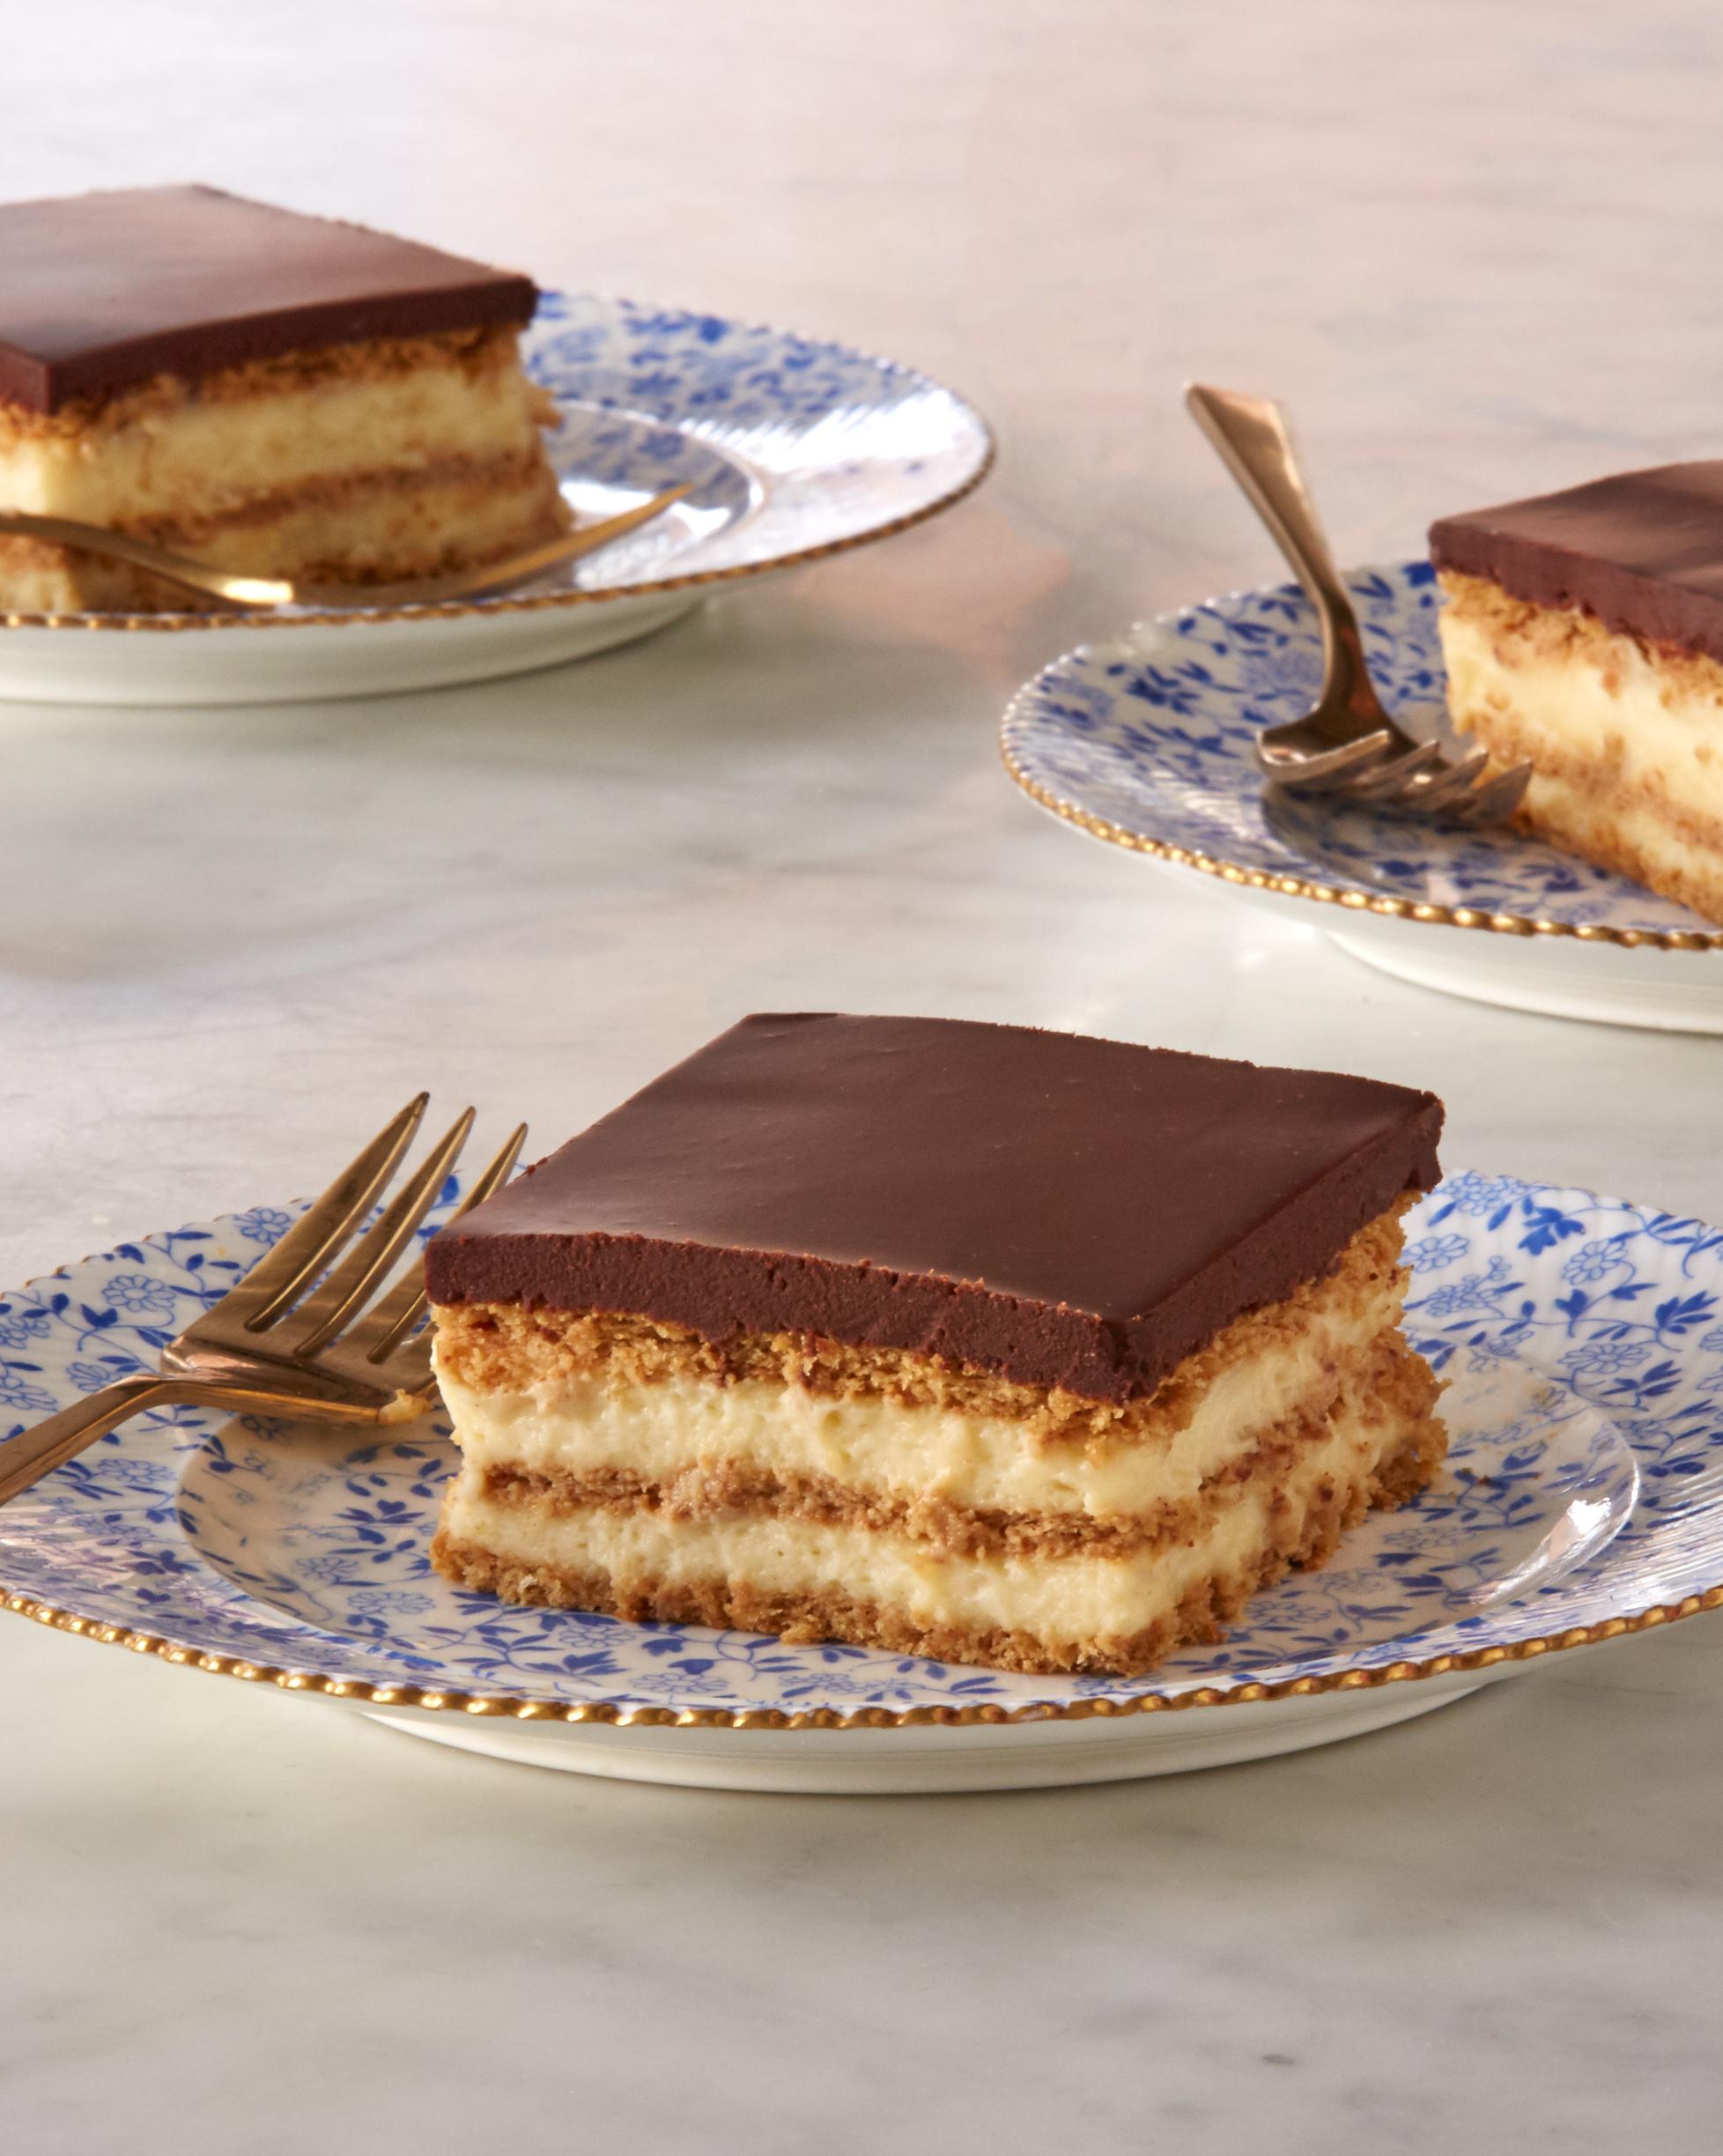 eclair-cake-0420-d112647.jpg